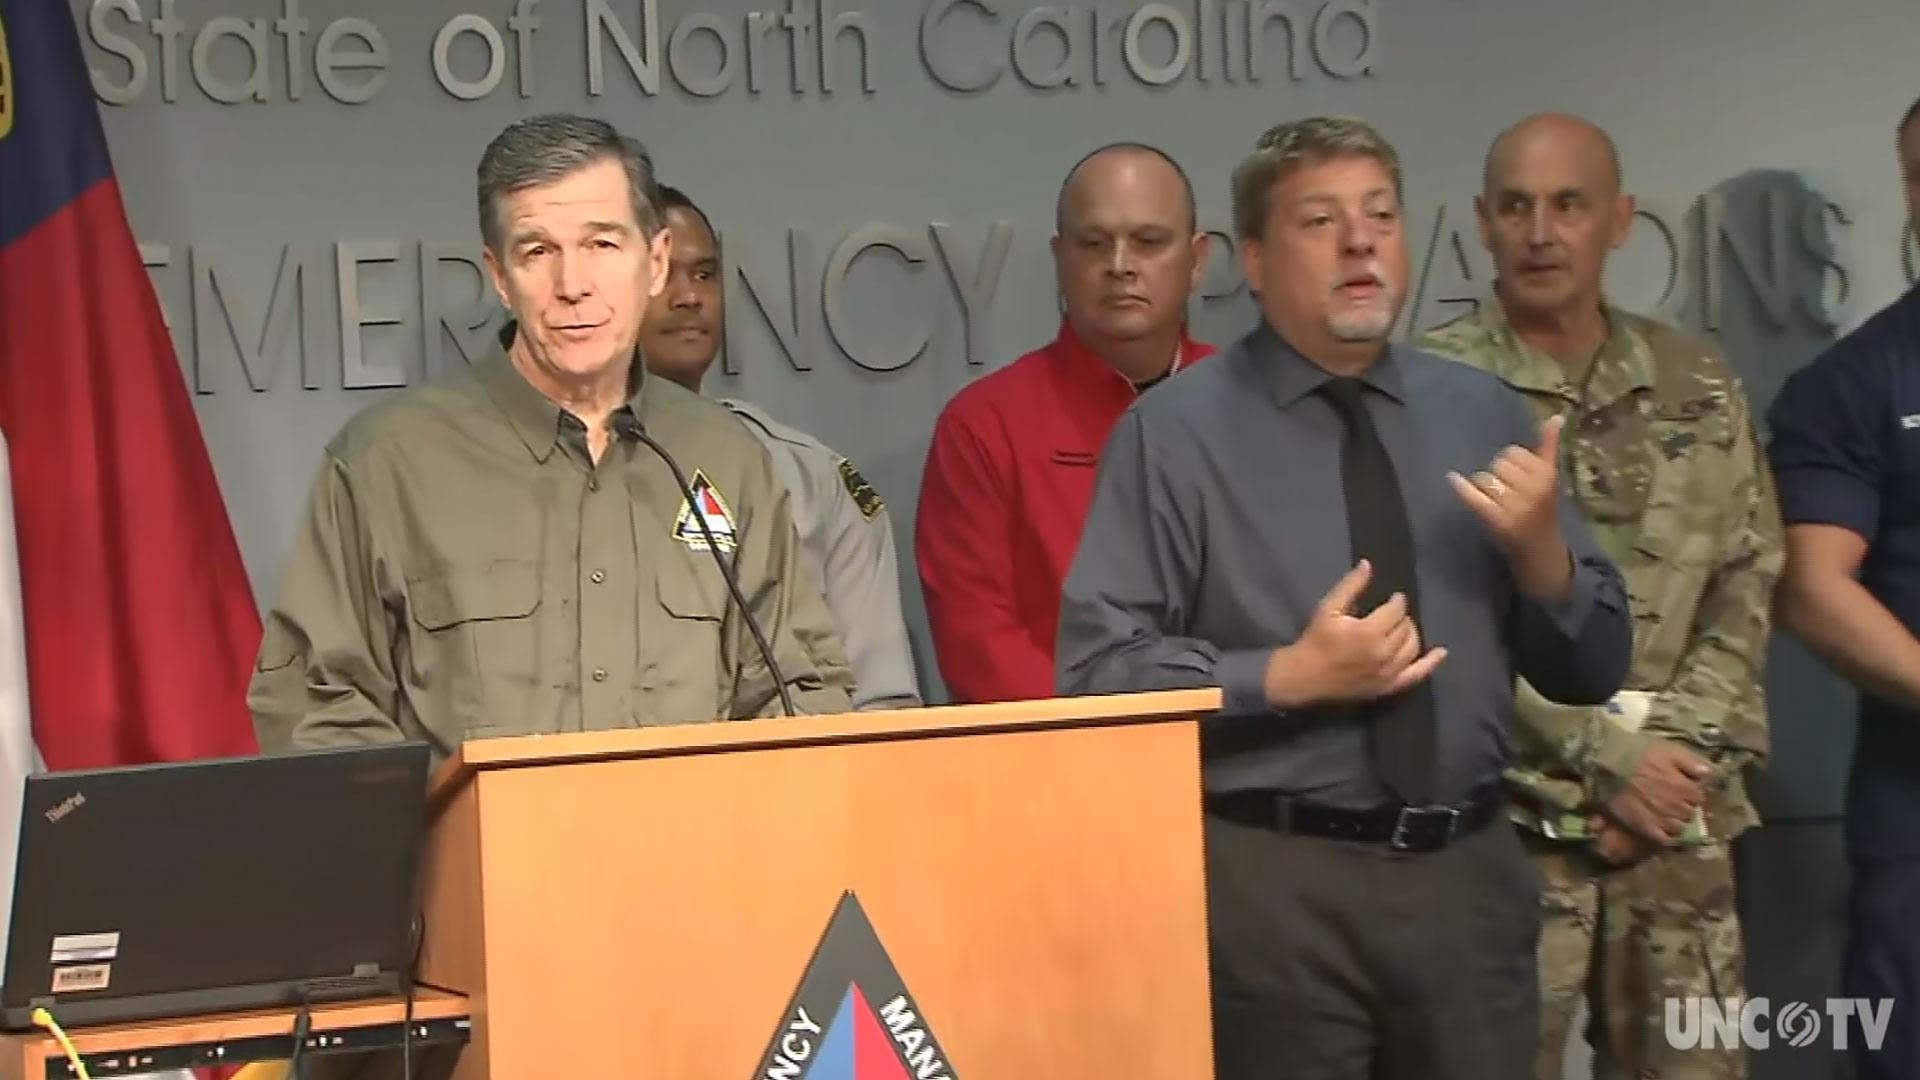 NC Gov. Cooper: Weather Briefing 10AM 09/05/19